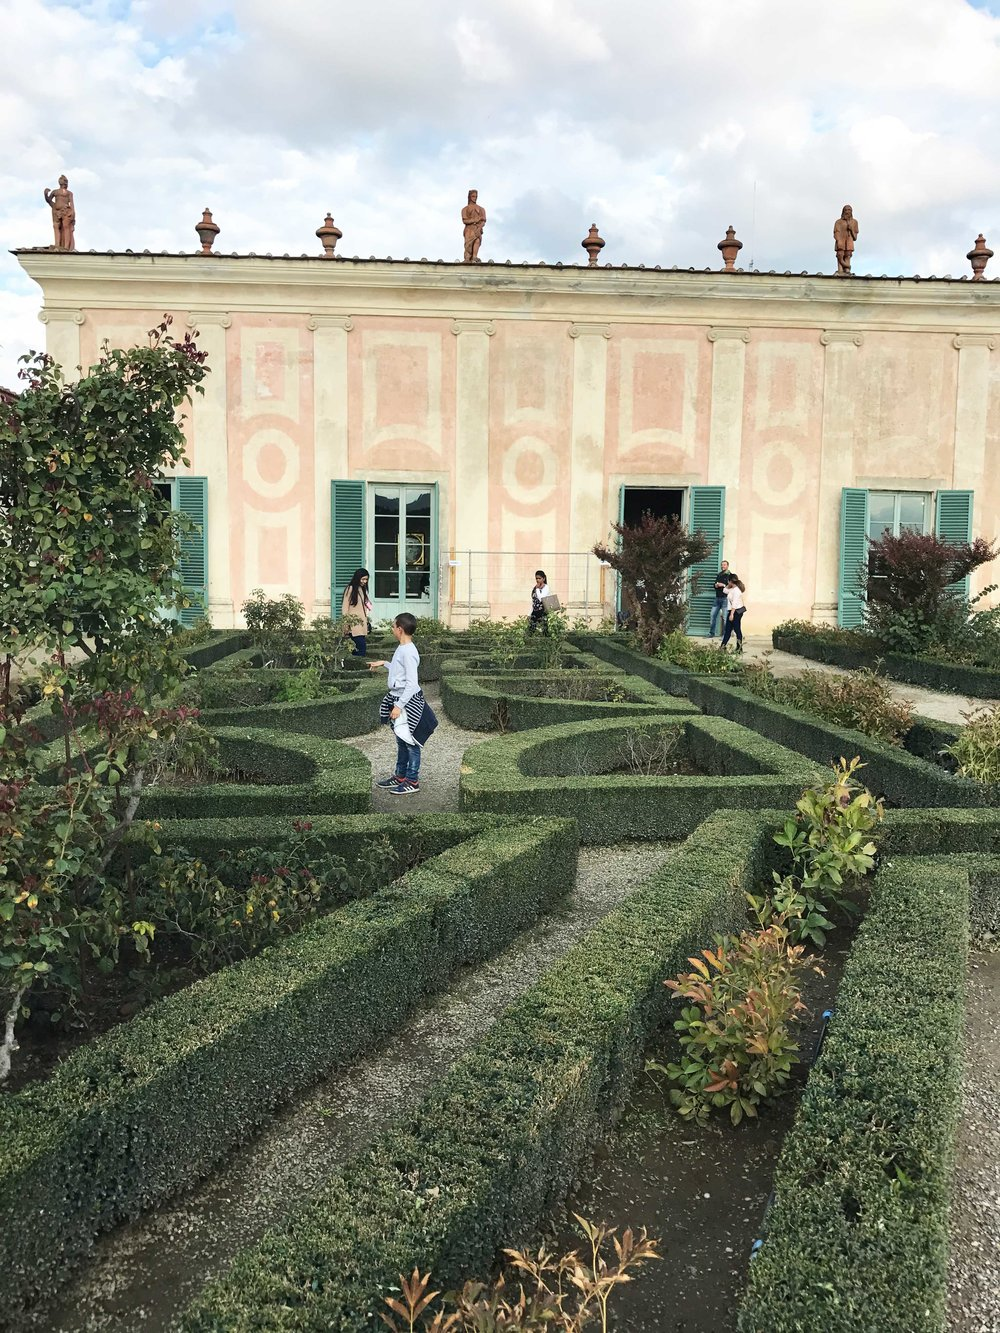 florence_gardens.jpg